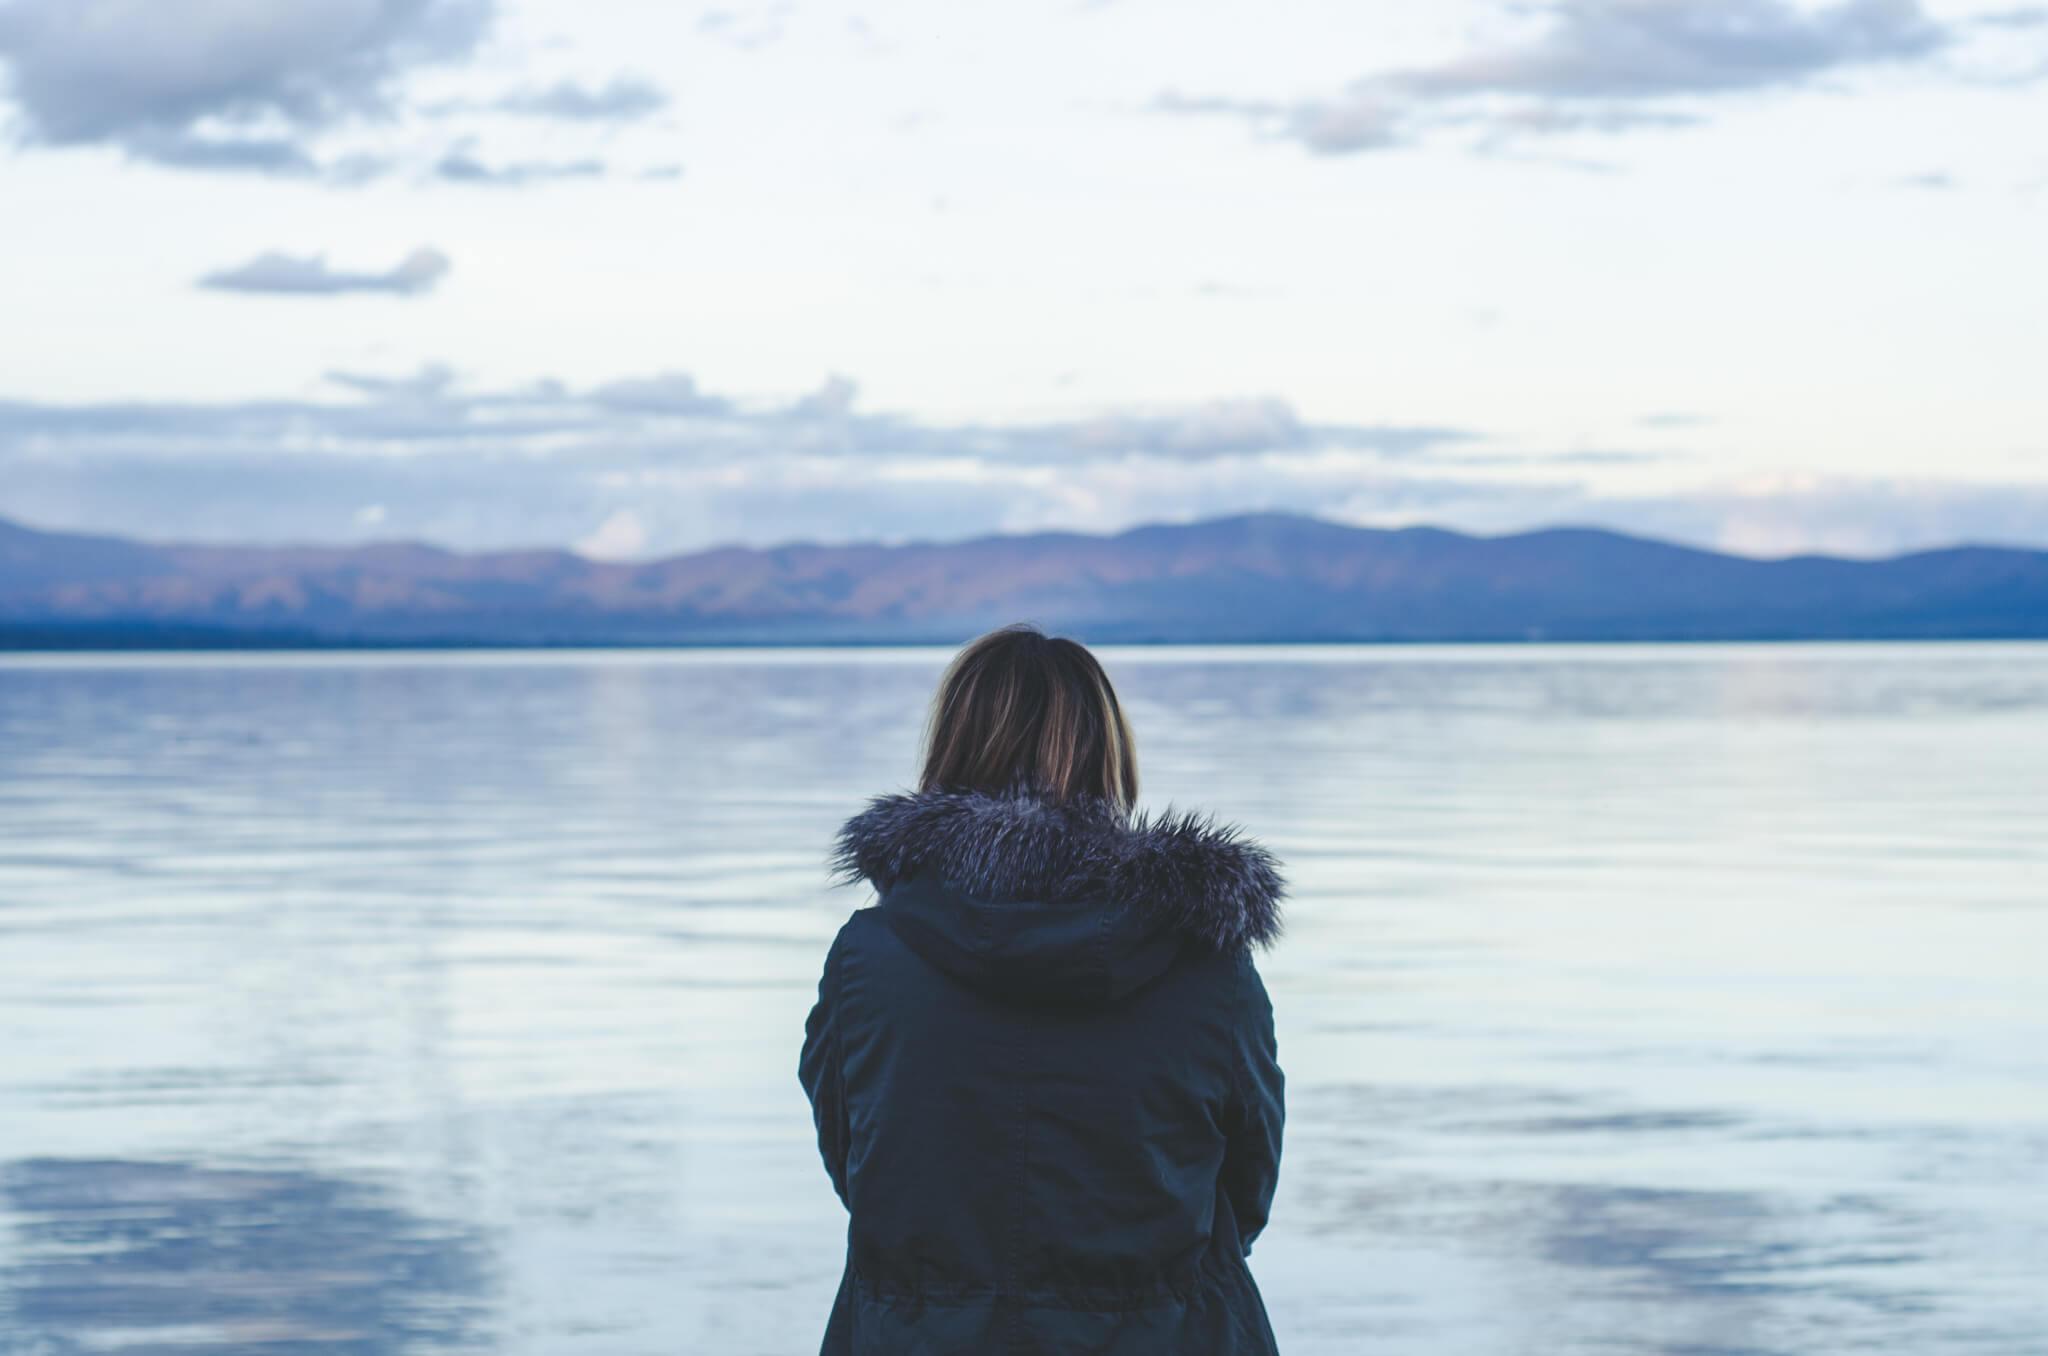 meditation, mindfulness, winter wellness